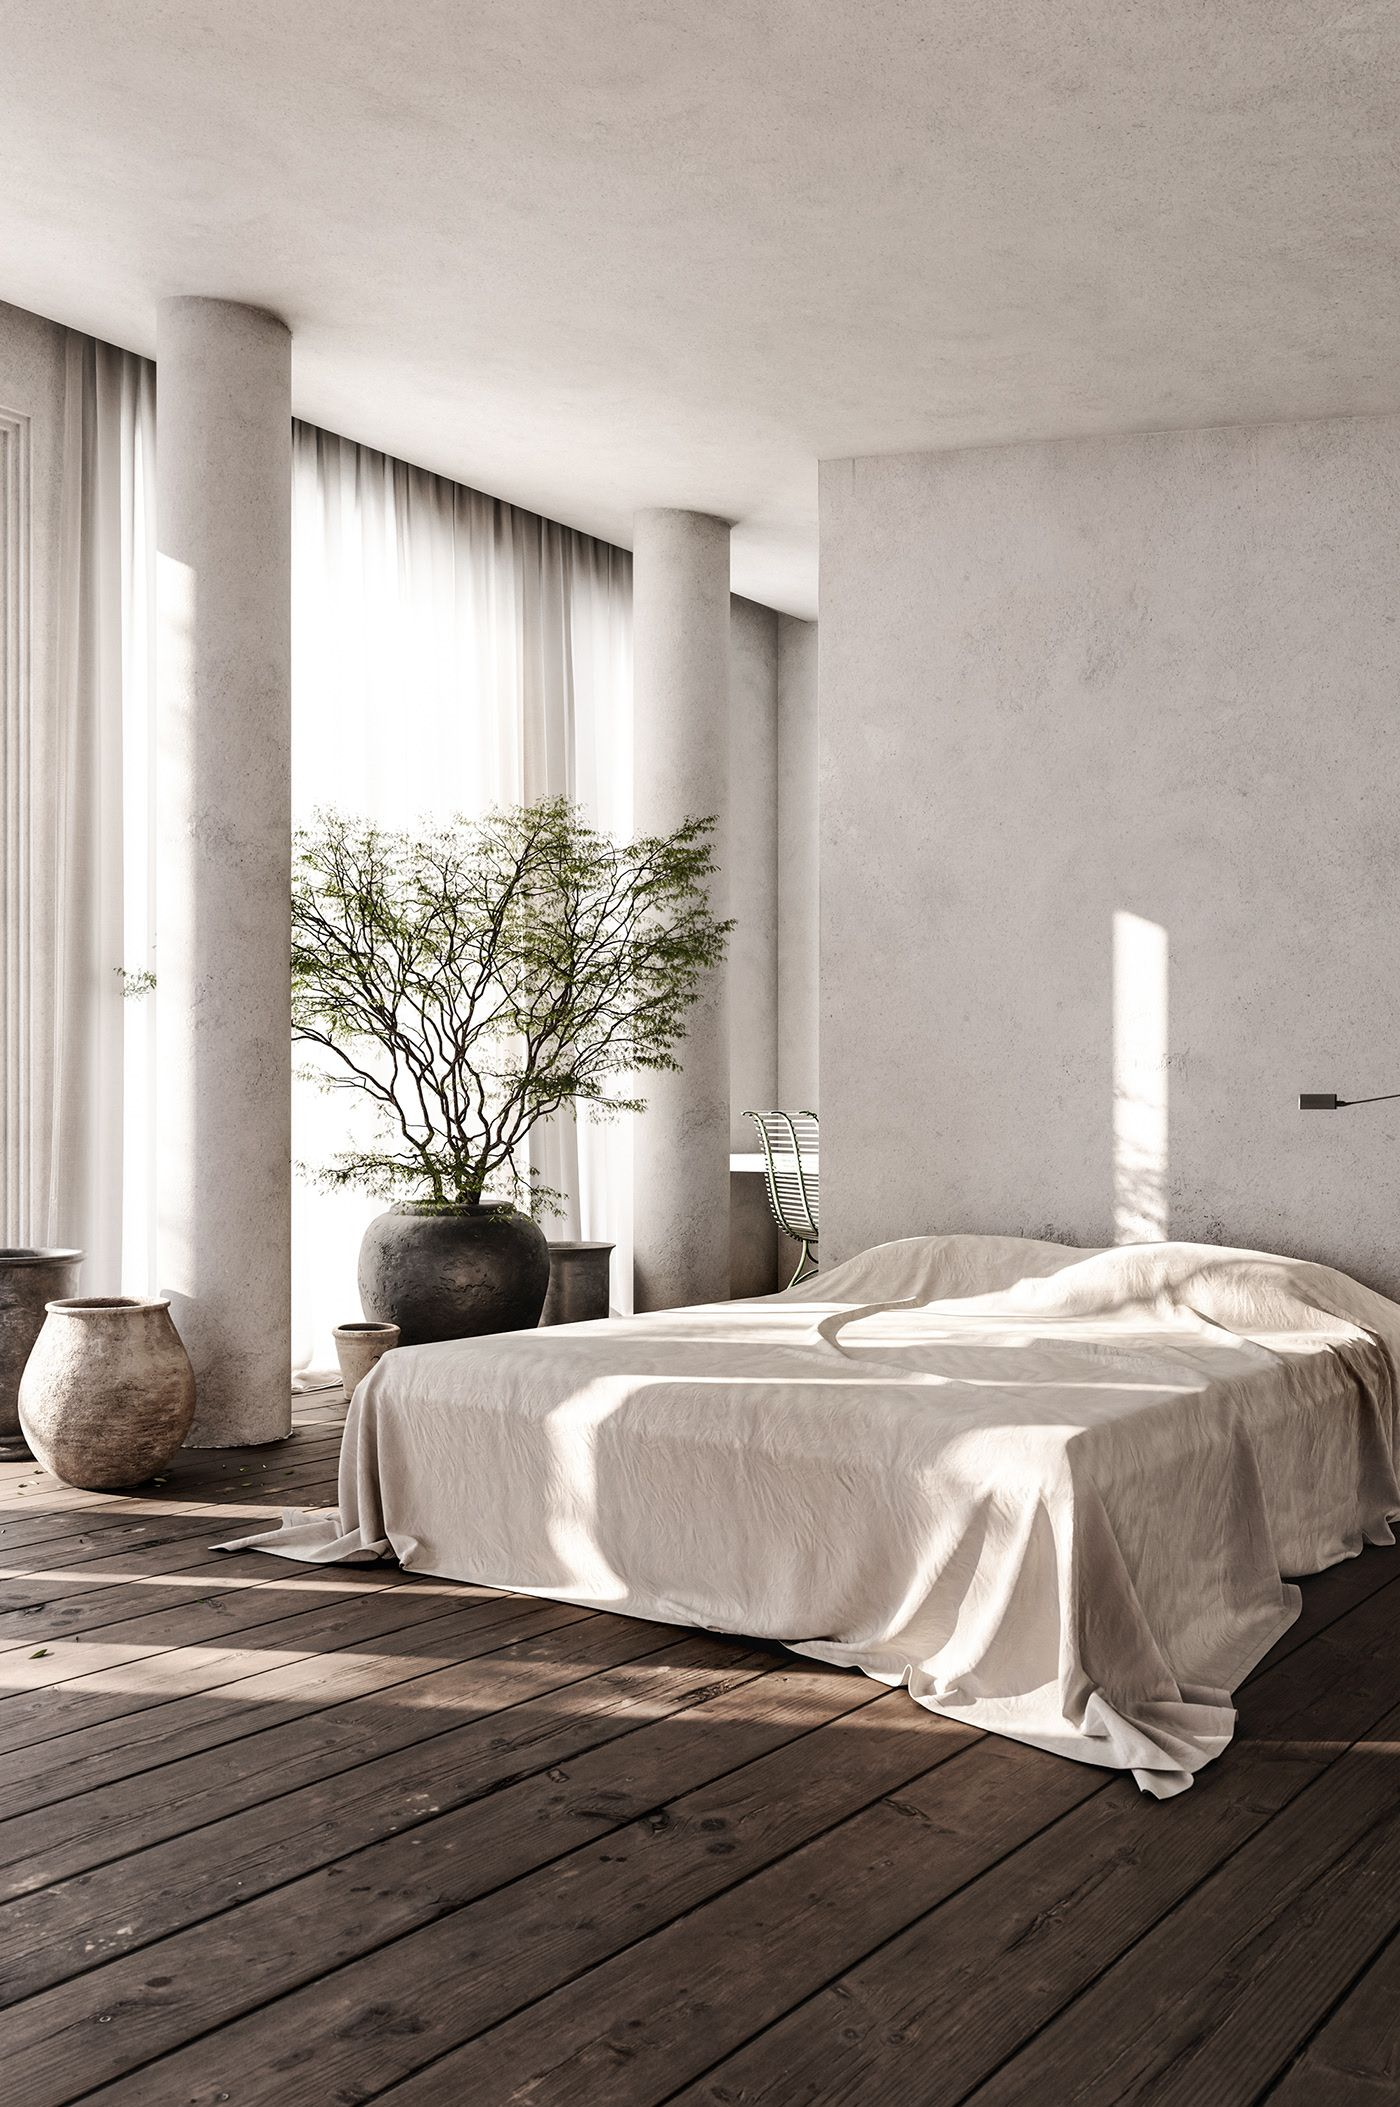 Minimalist Bedroom Interior Design Concept Bedroom Interior Home Decor Interior Design Beautiful bedroom interior design